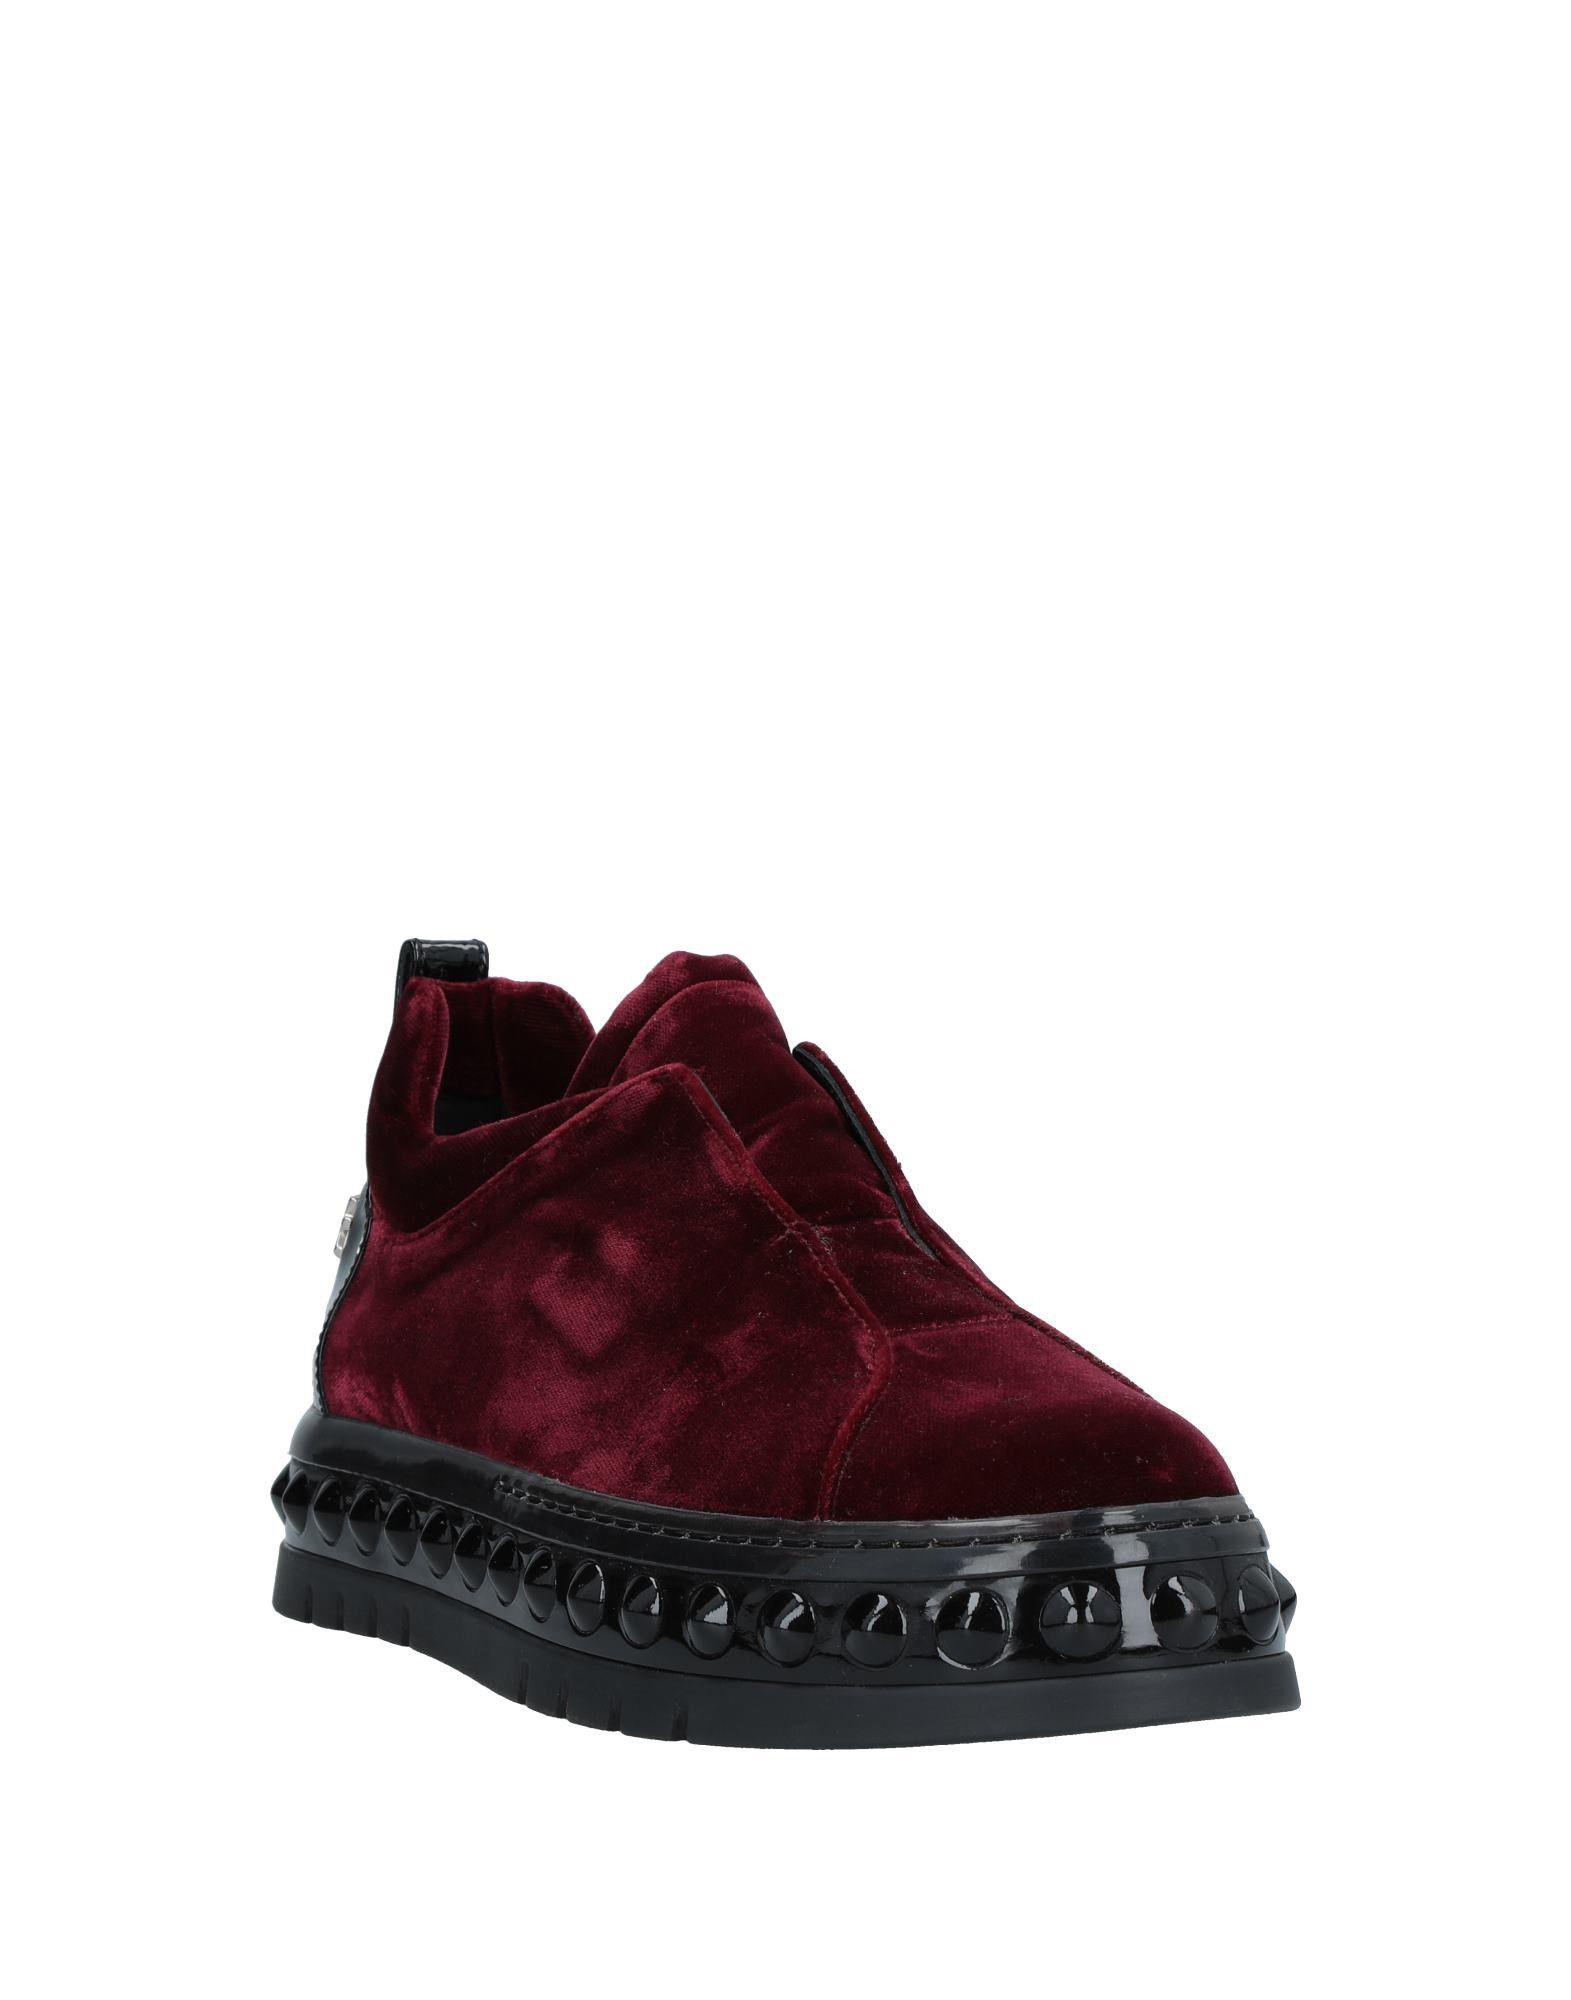 Stilvolle Premiata billige Schuhe Premiata Stilvolle Sneakers Damen  11529610CW c8bbe2